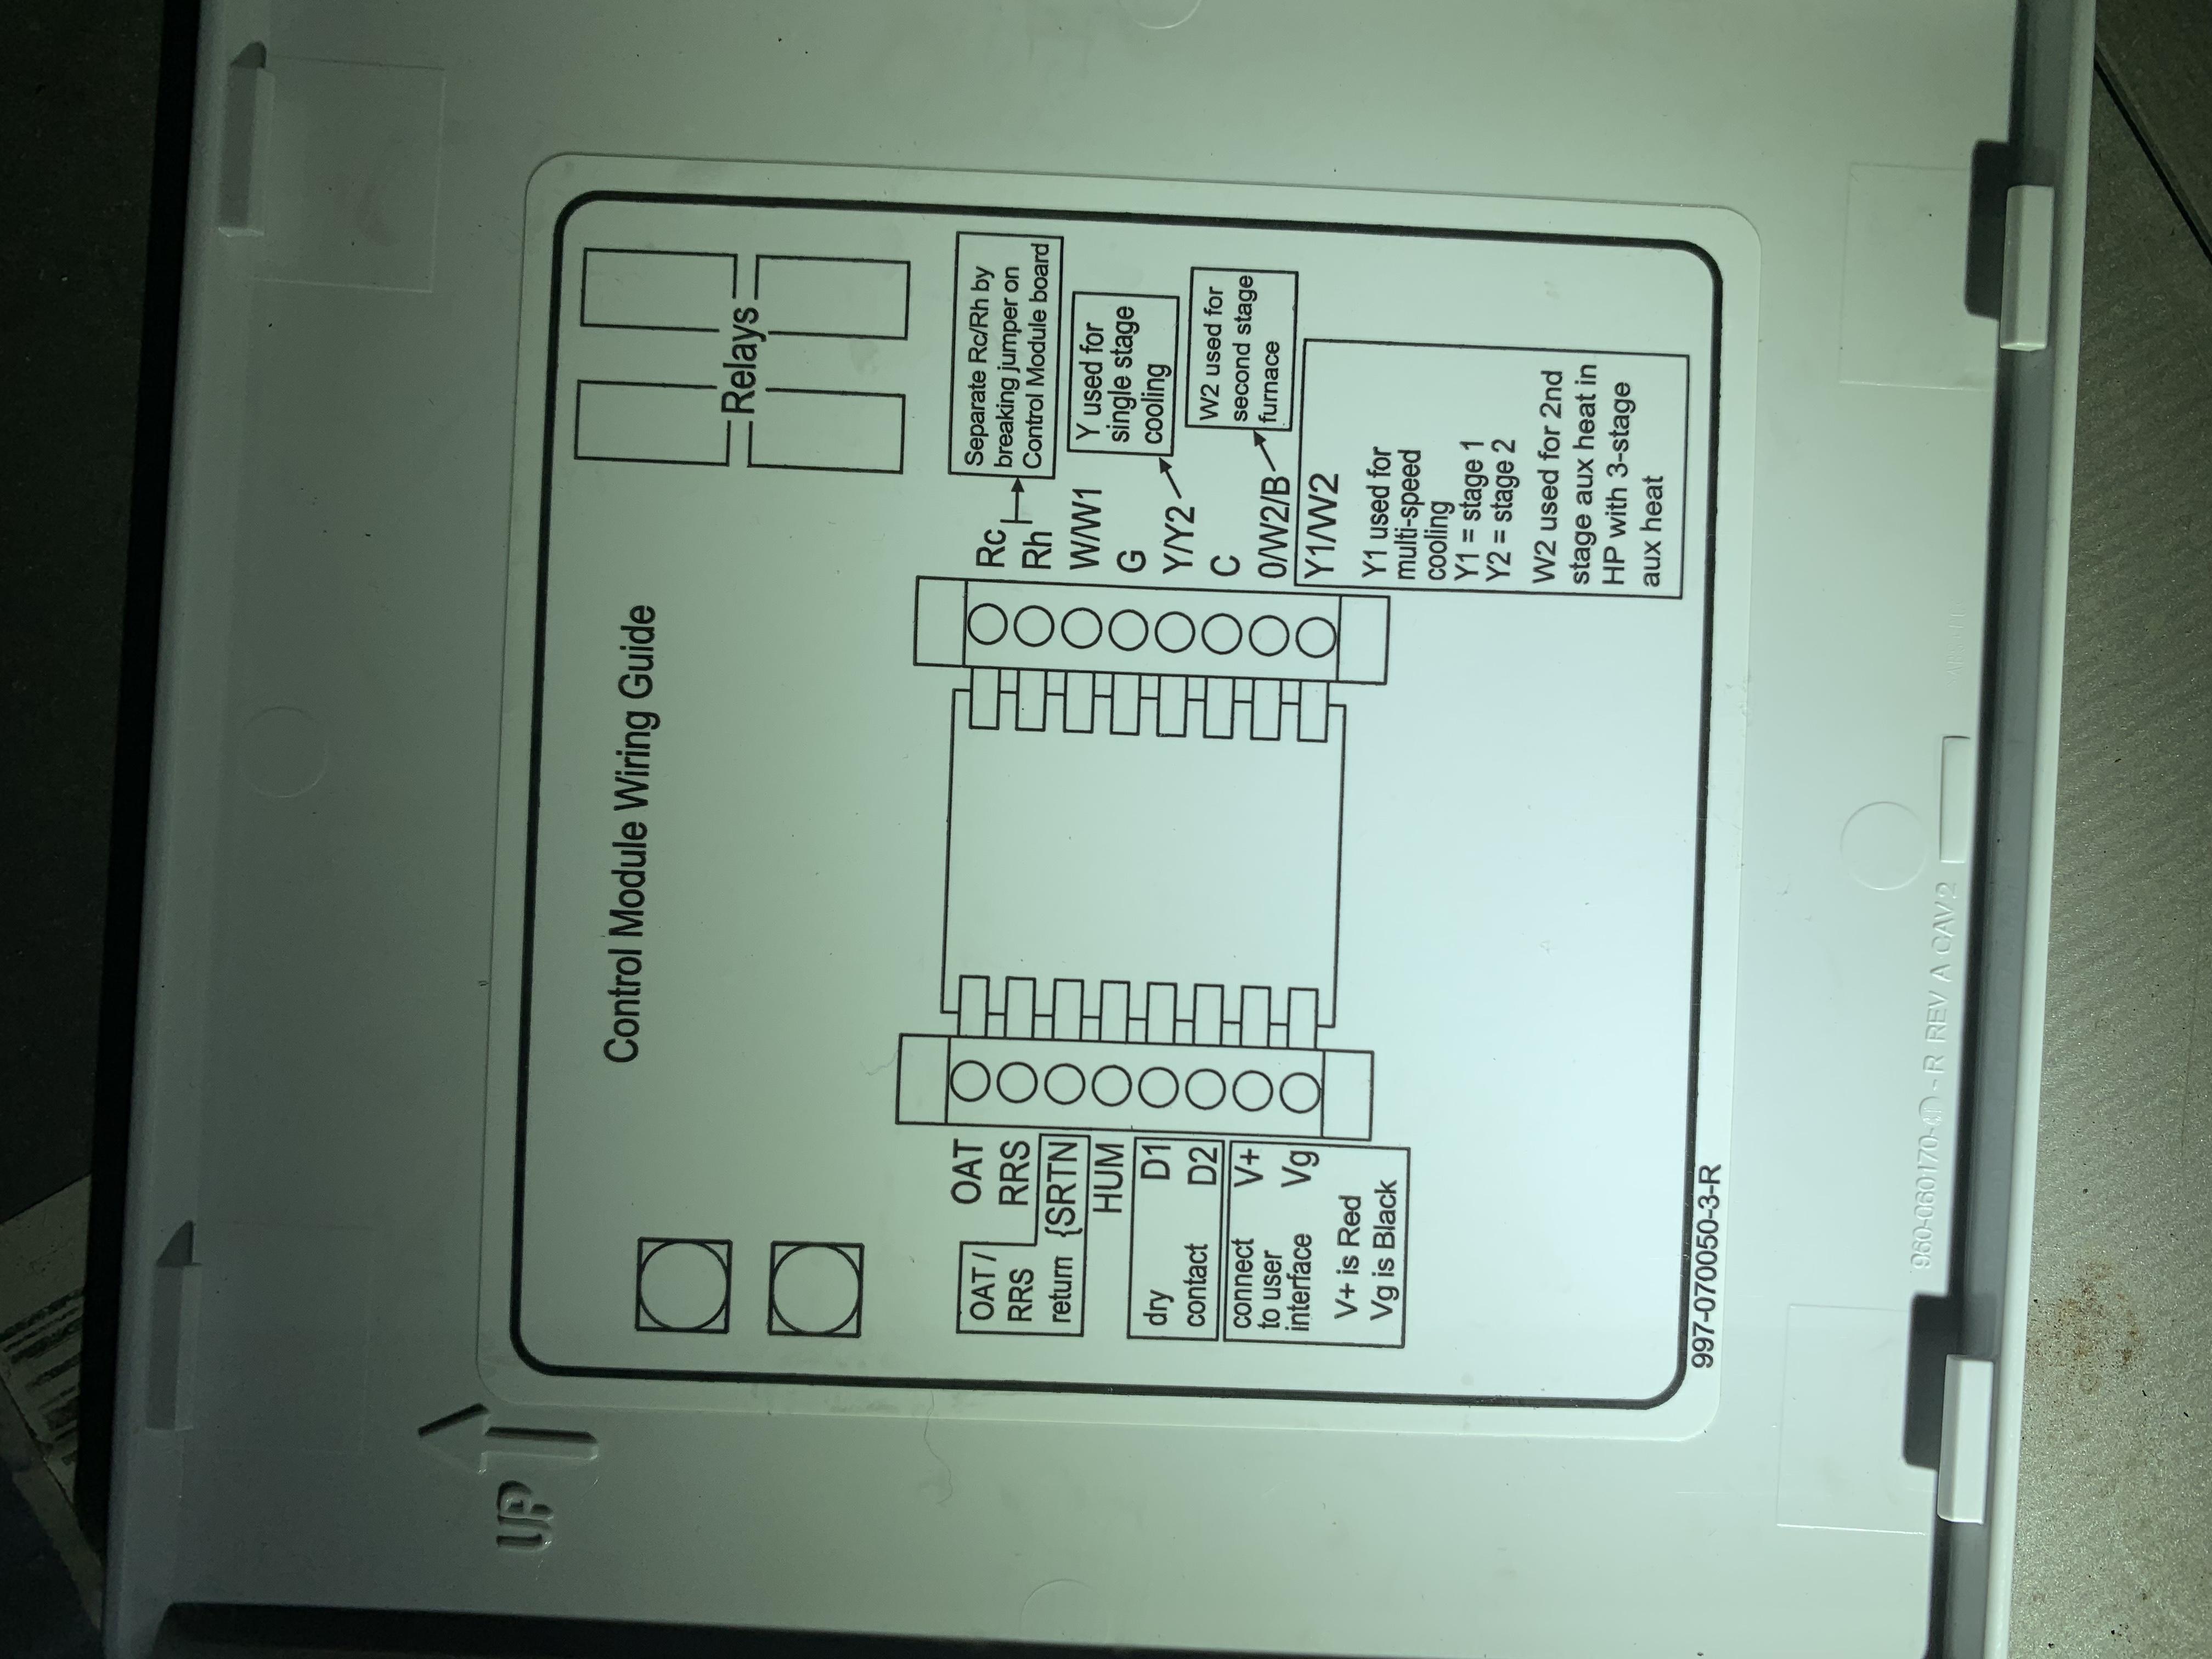 need help wiring nest thermostat google nest help carrier thermostat wiring abcd replacing carrier thermostat with nest